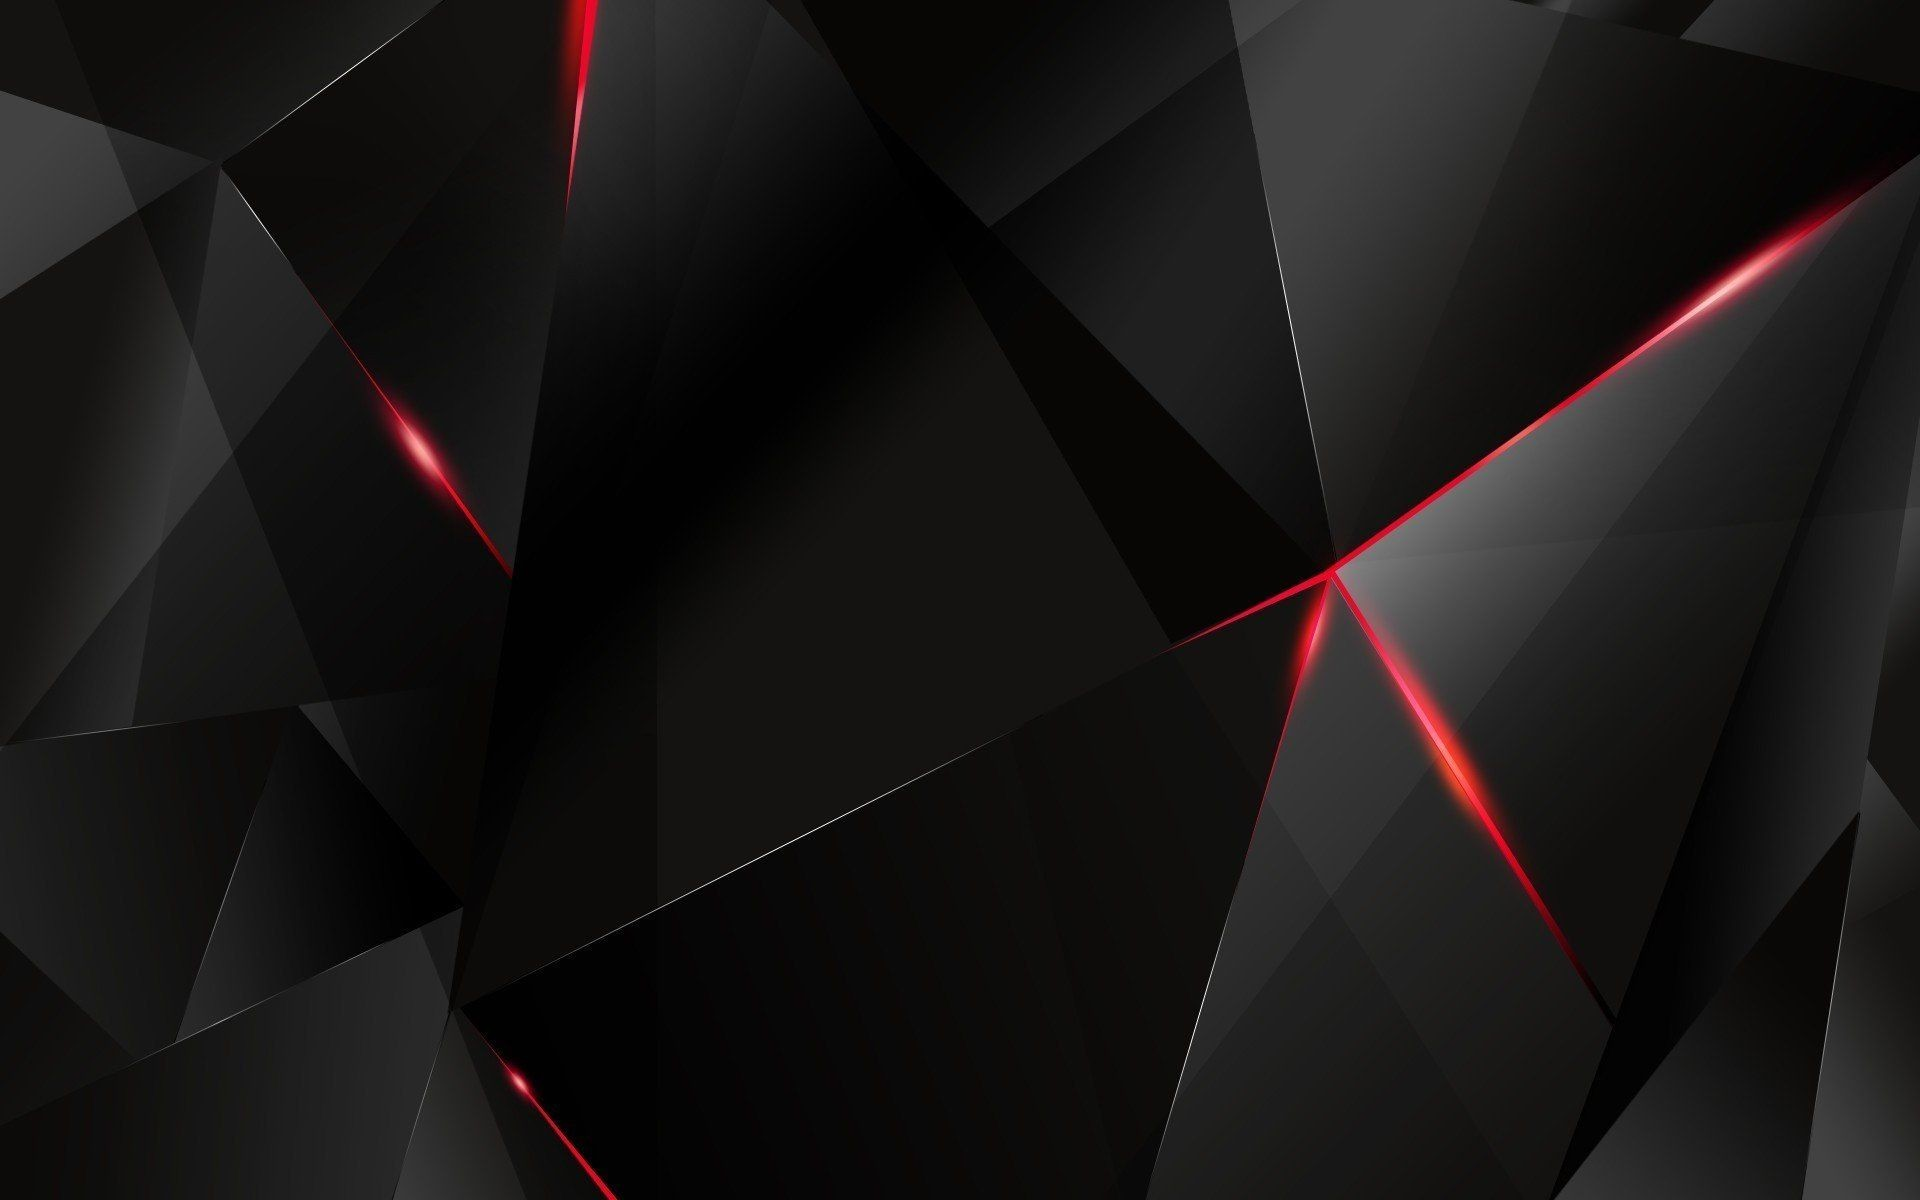 Black Cool Background (73+ Images